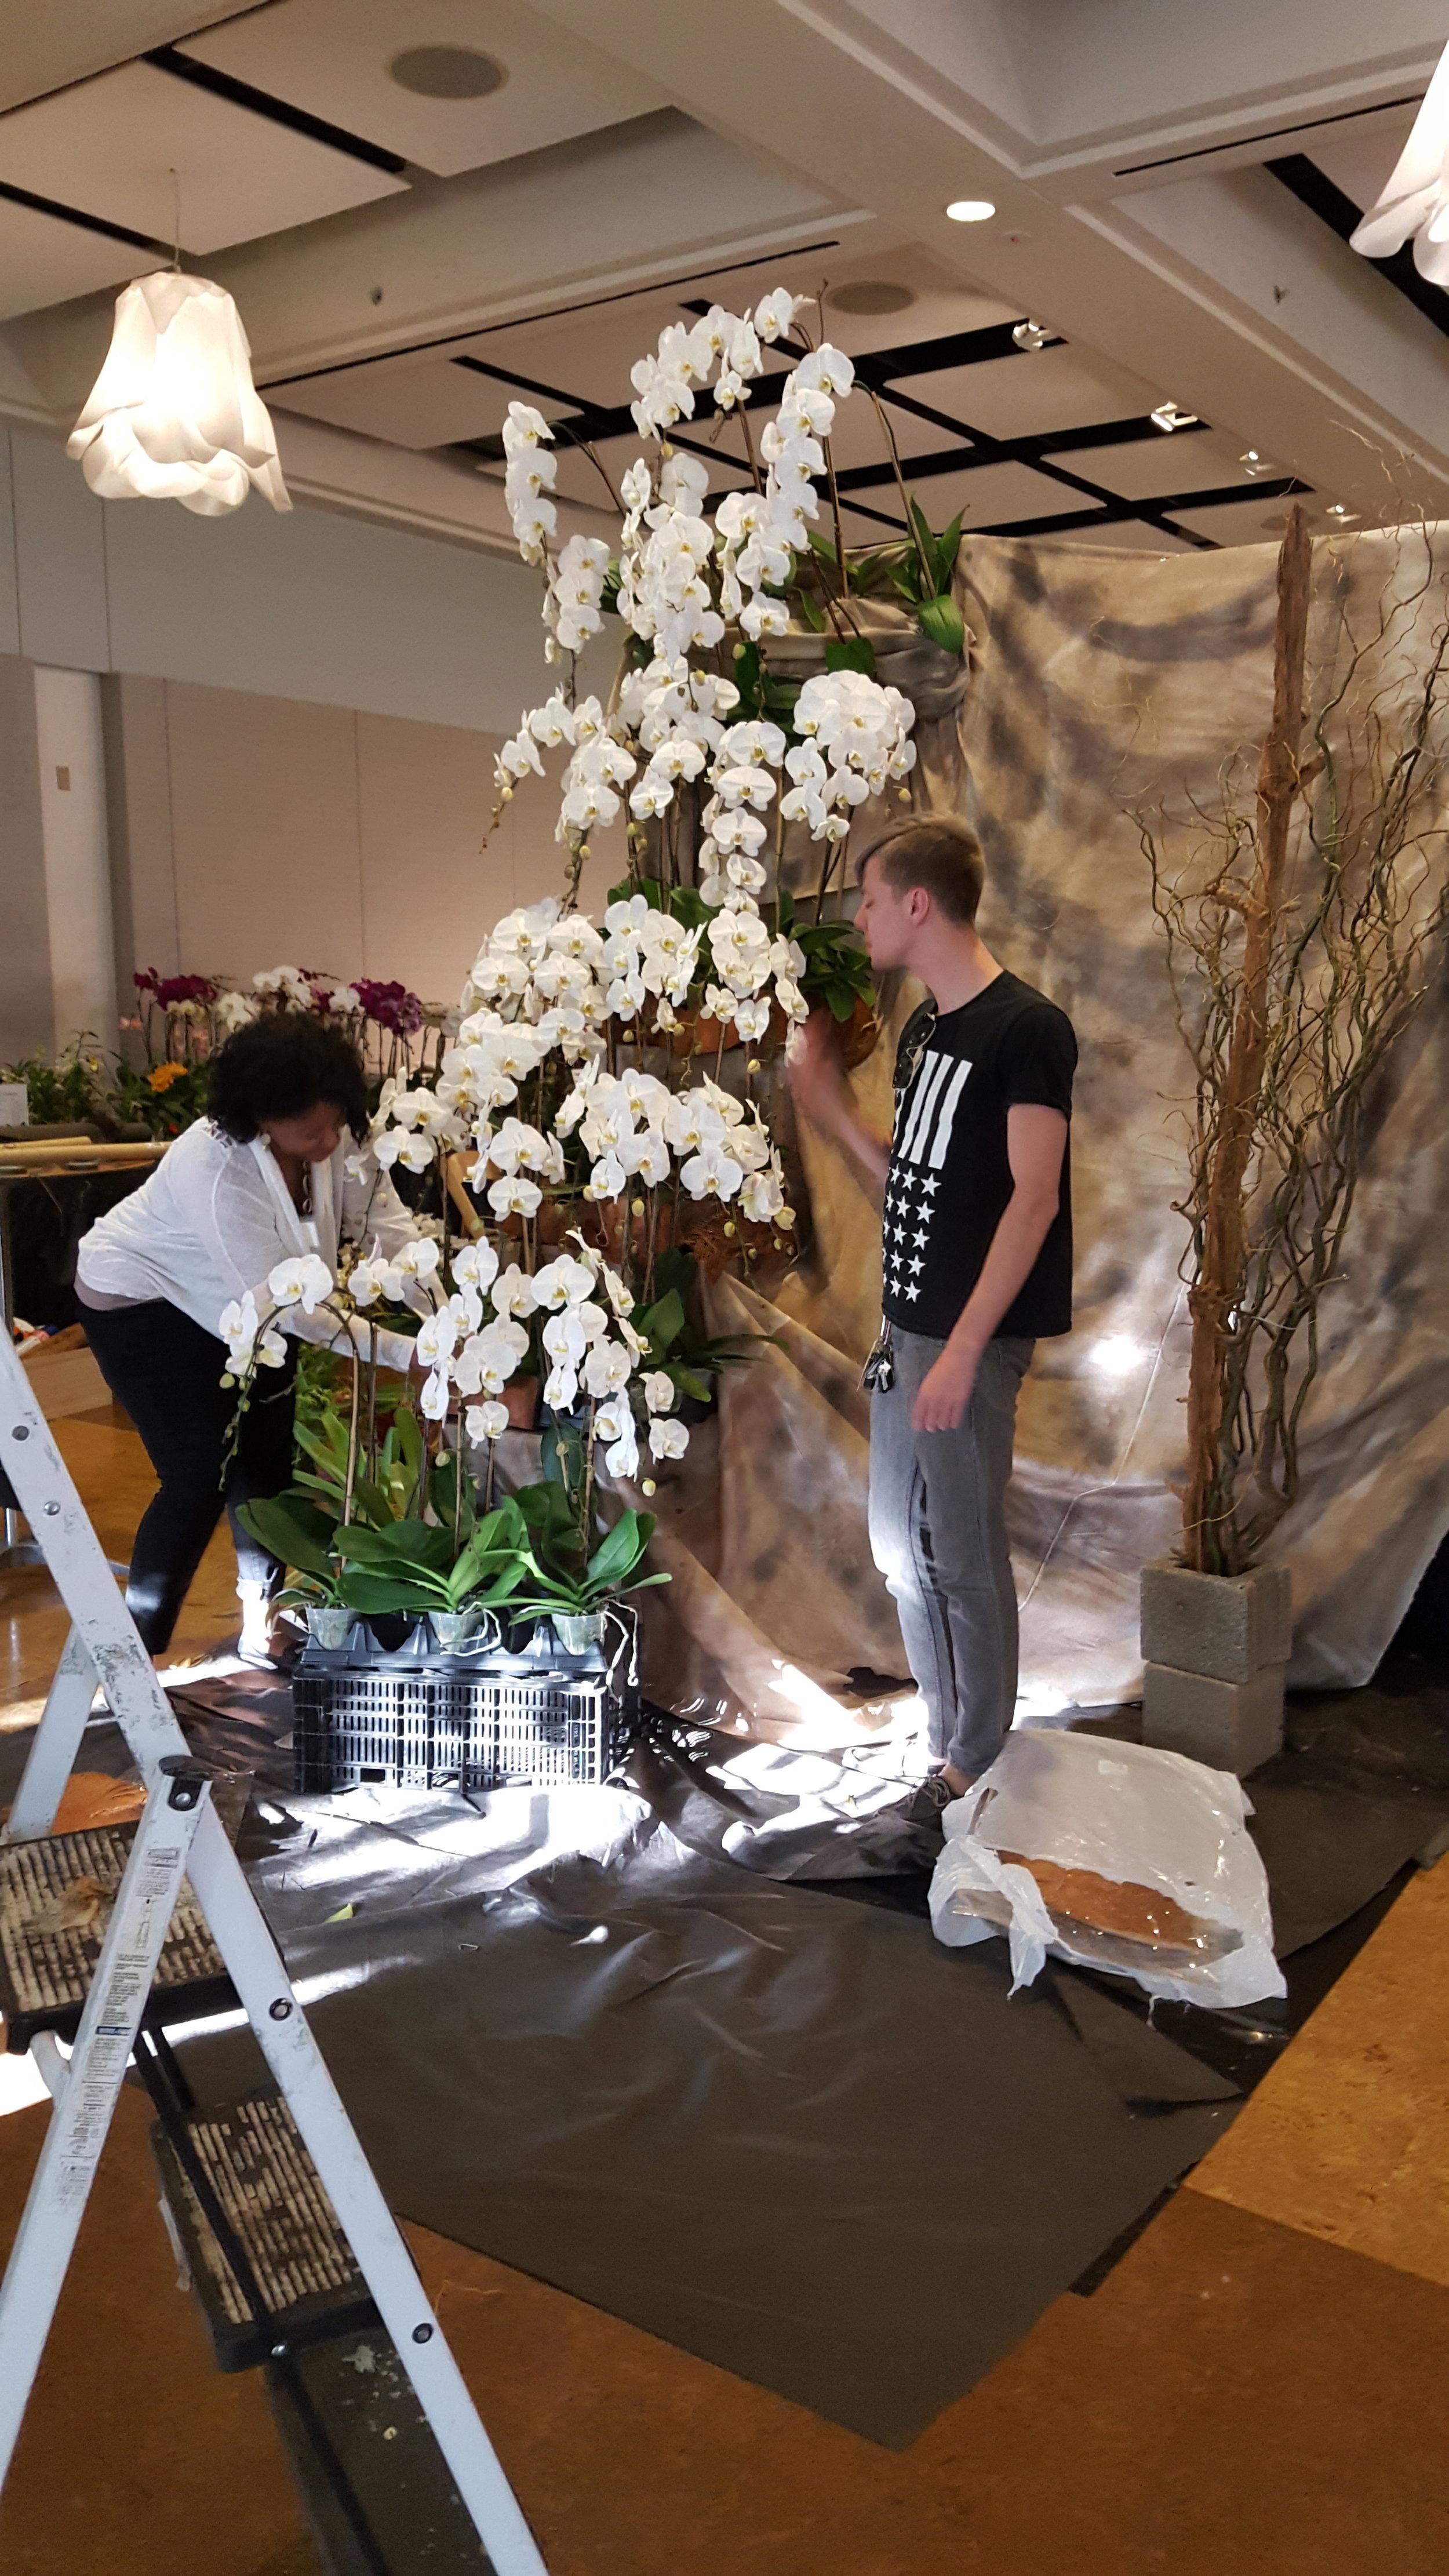 Saundra Nixon and Kyle Broflovski help assemble the exhibit.